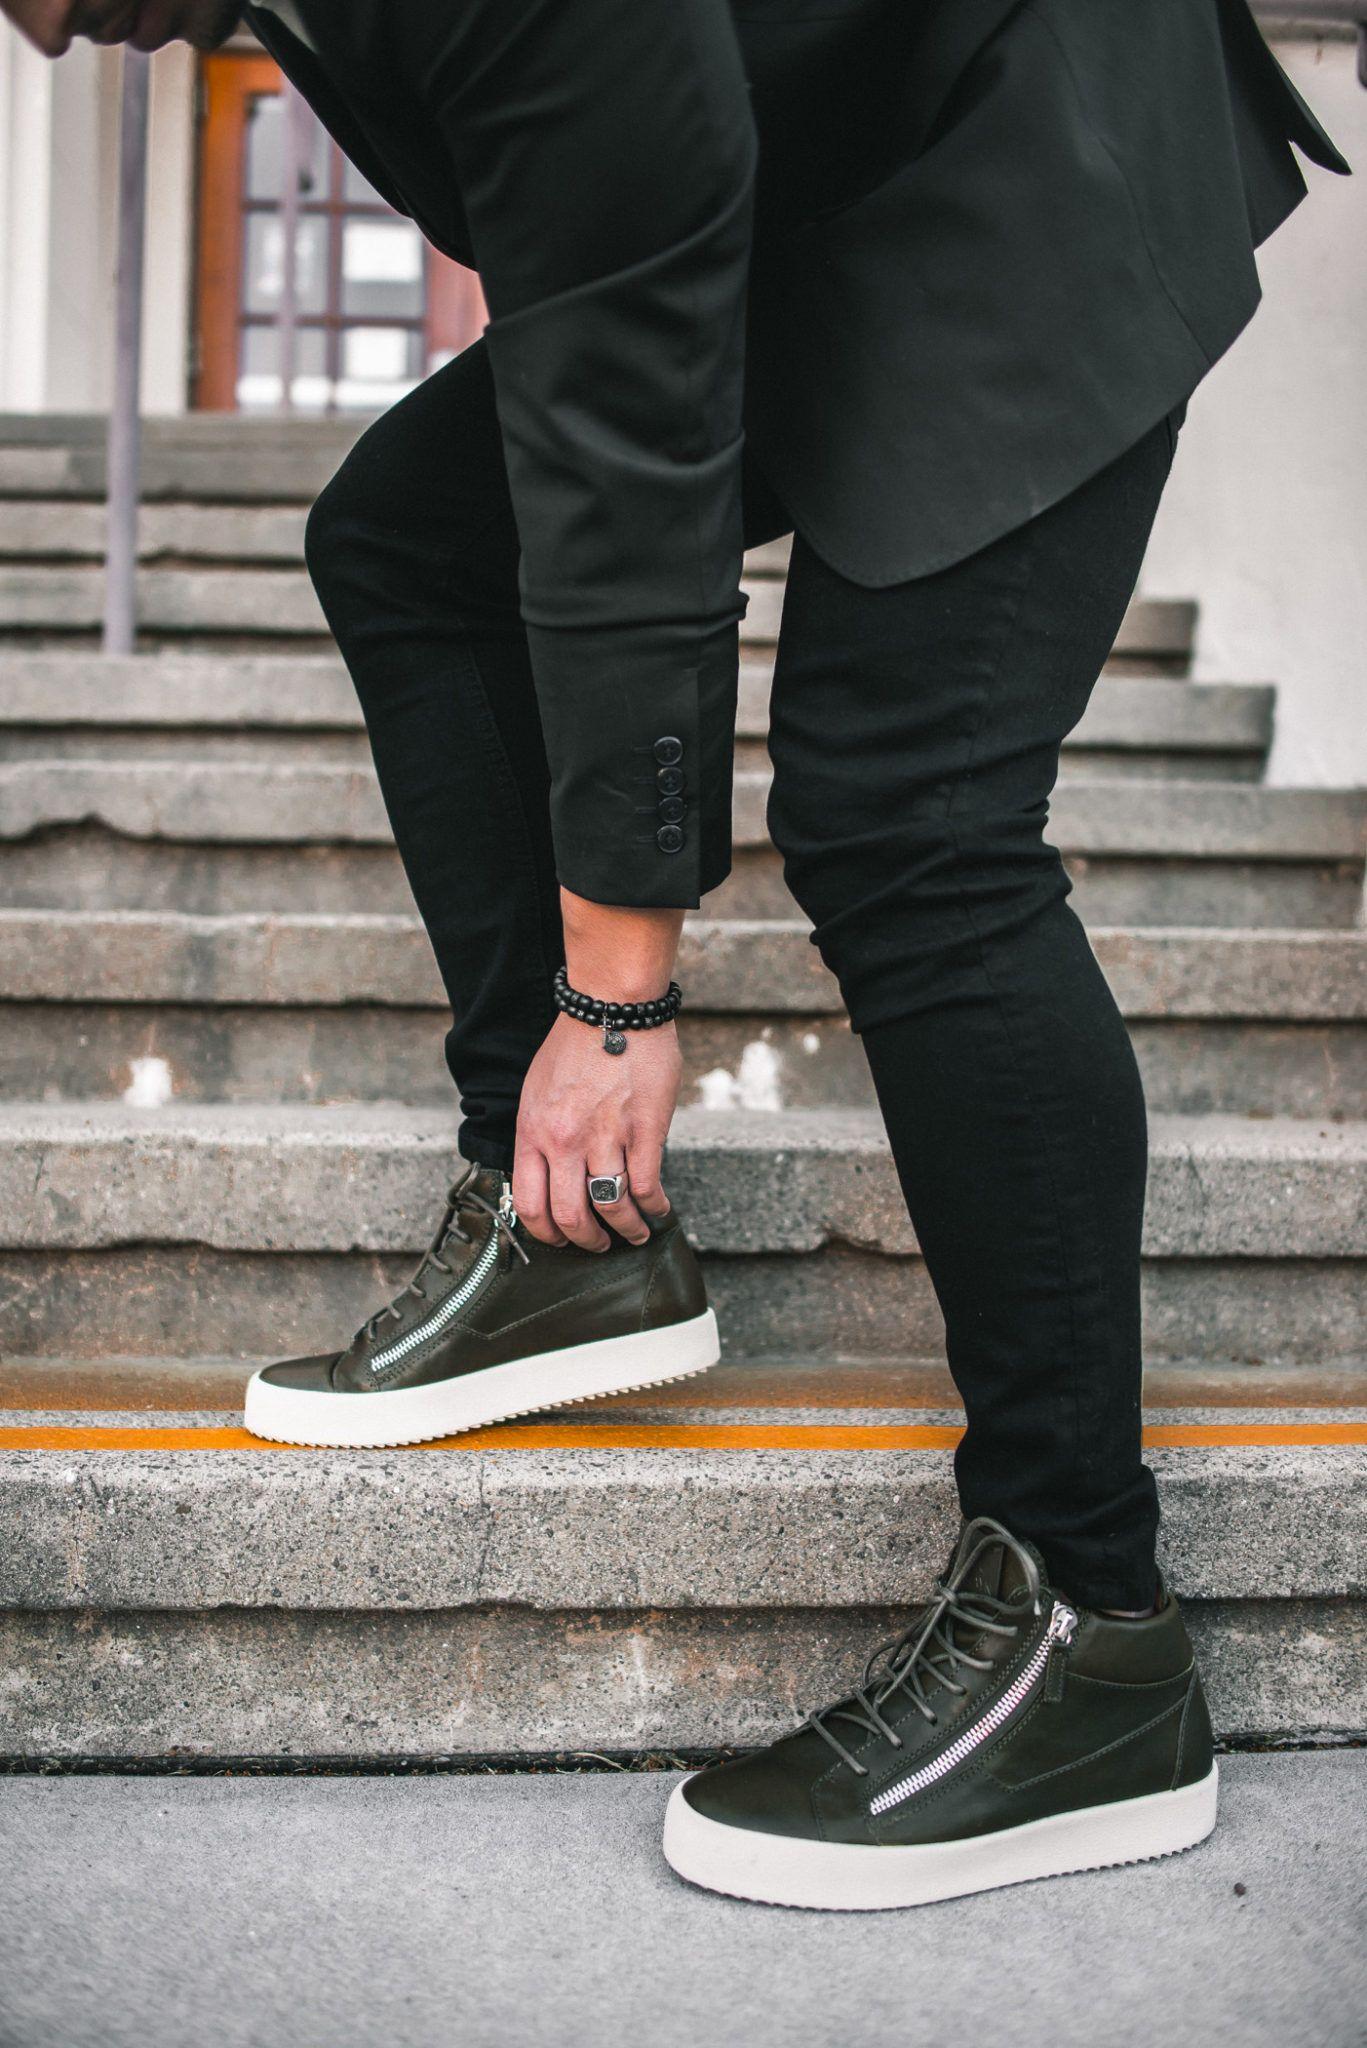 340f514461e Men s Black Blazer and High Top Sneakers Outfit Idea  GiuseppeZanotti   sneakers